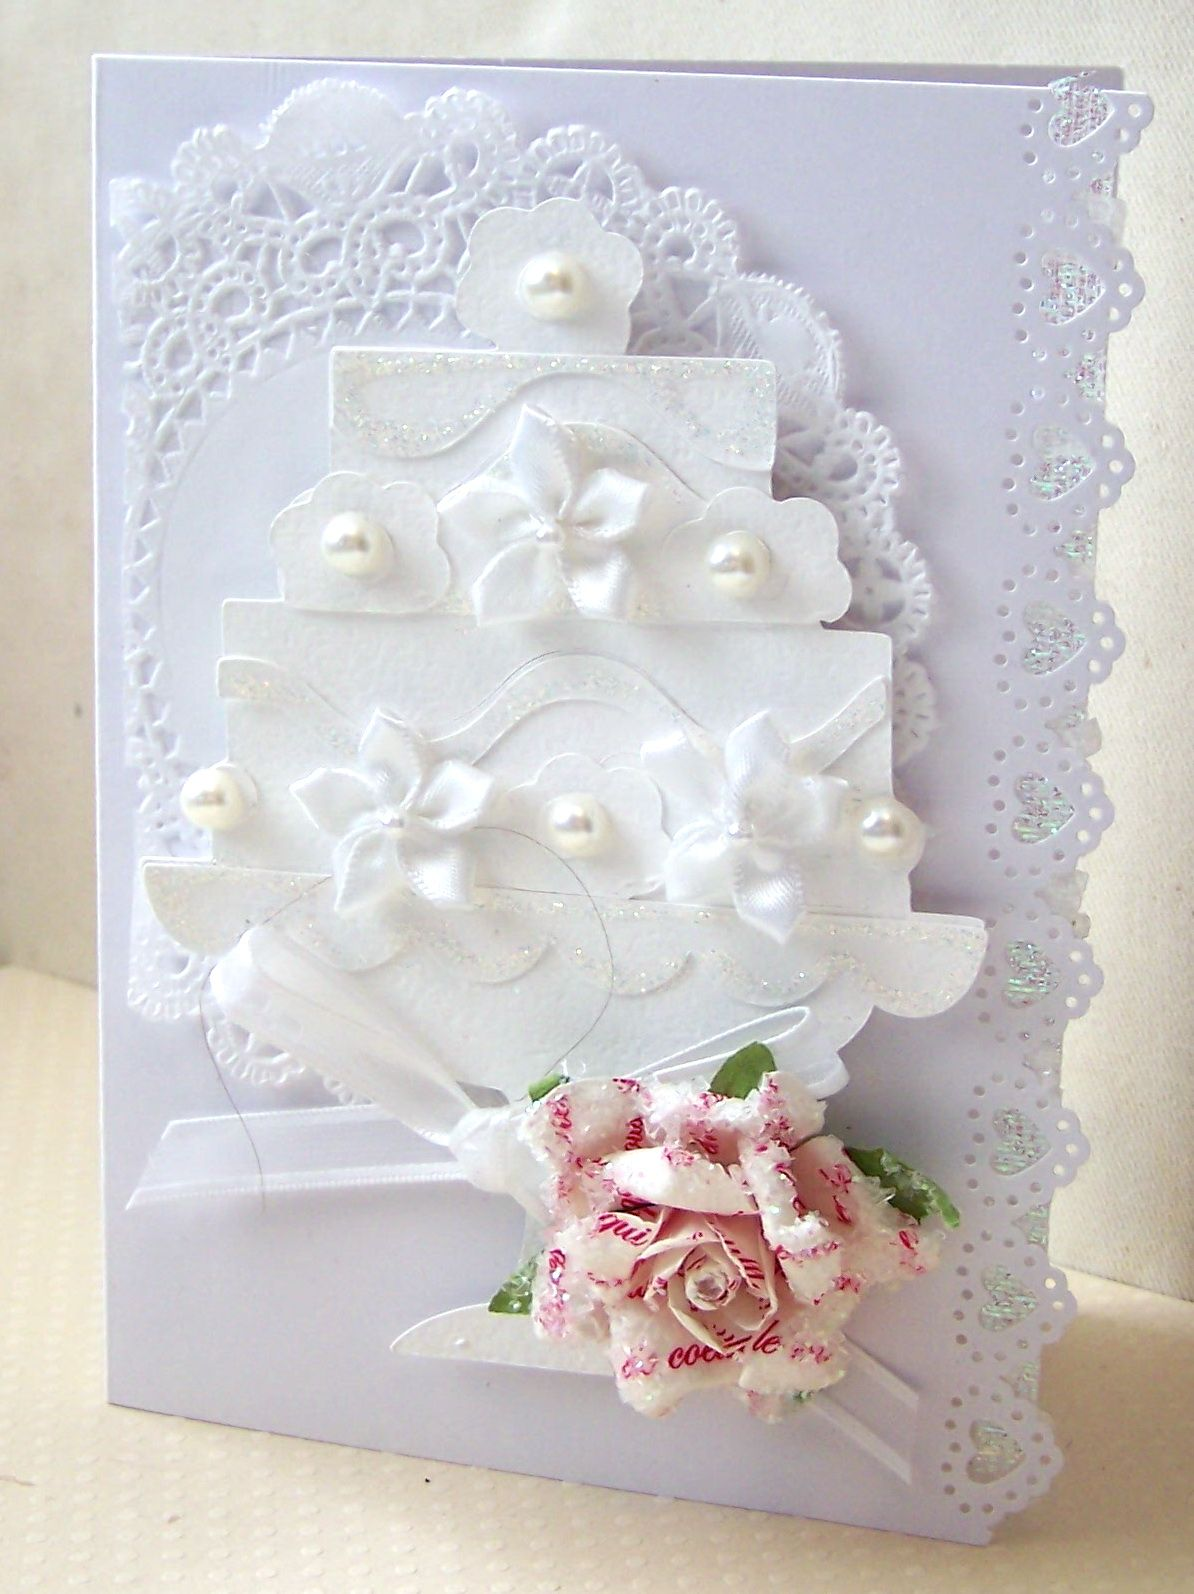 How to scrapbook wedding cards - Card Wedding